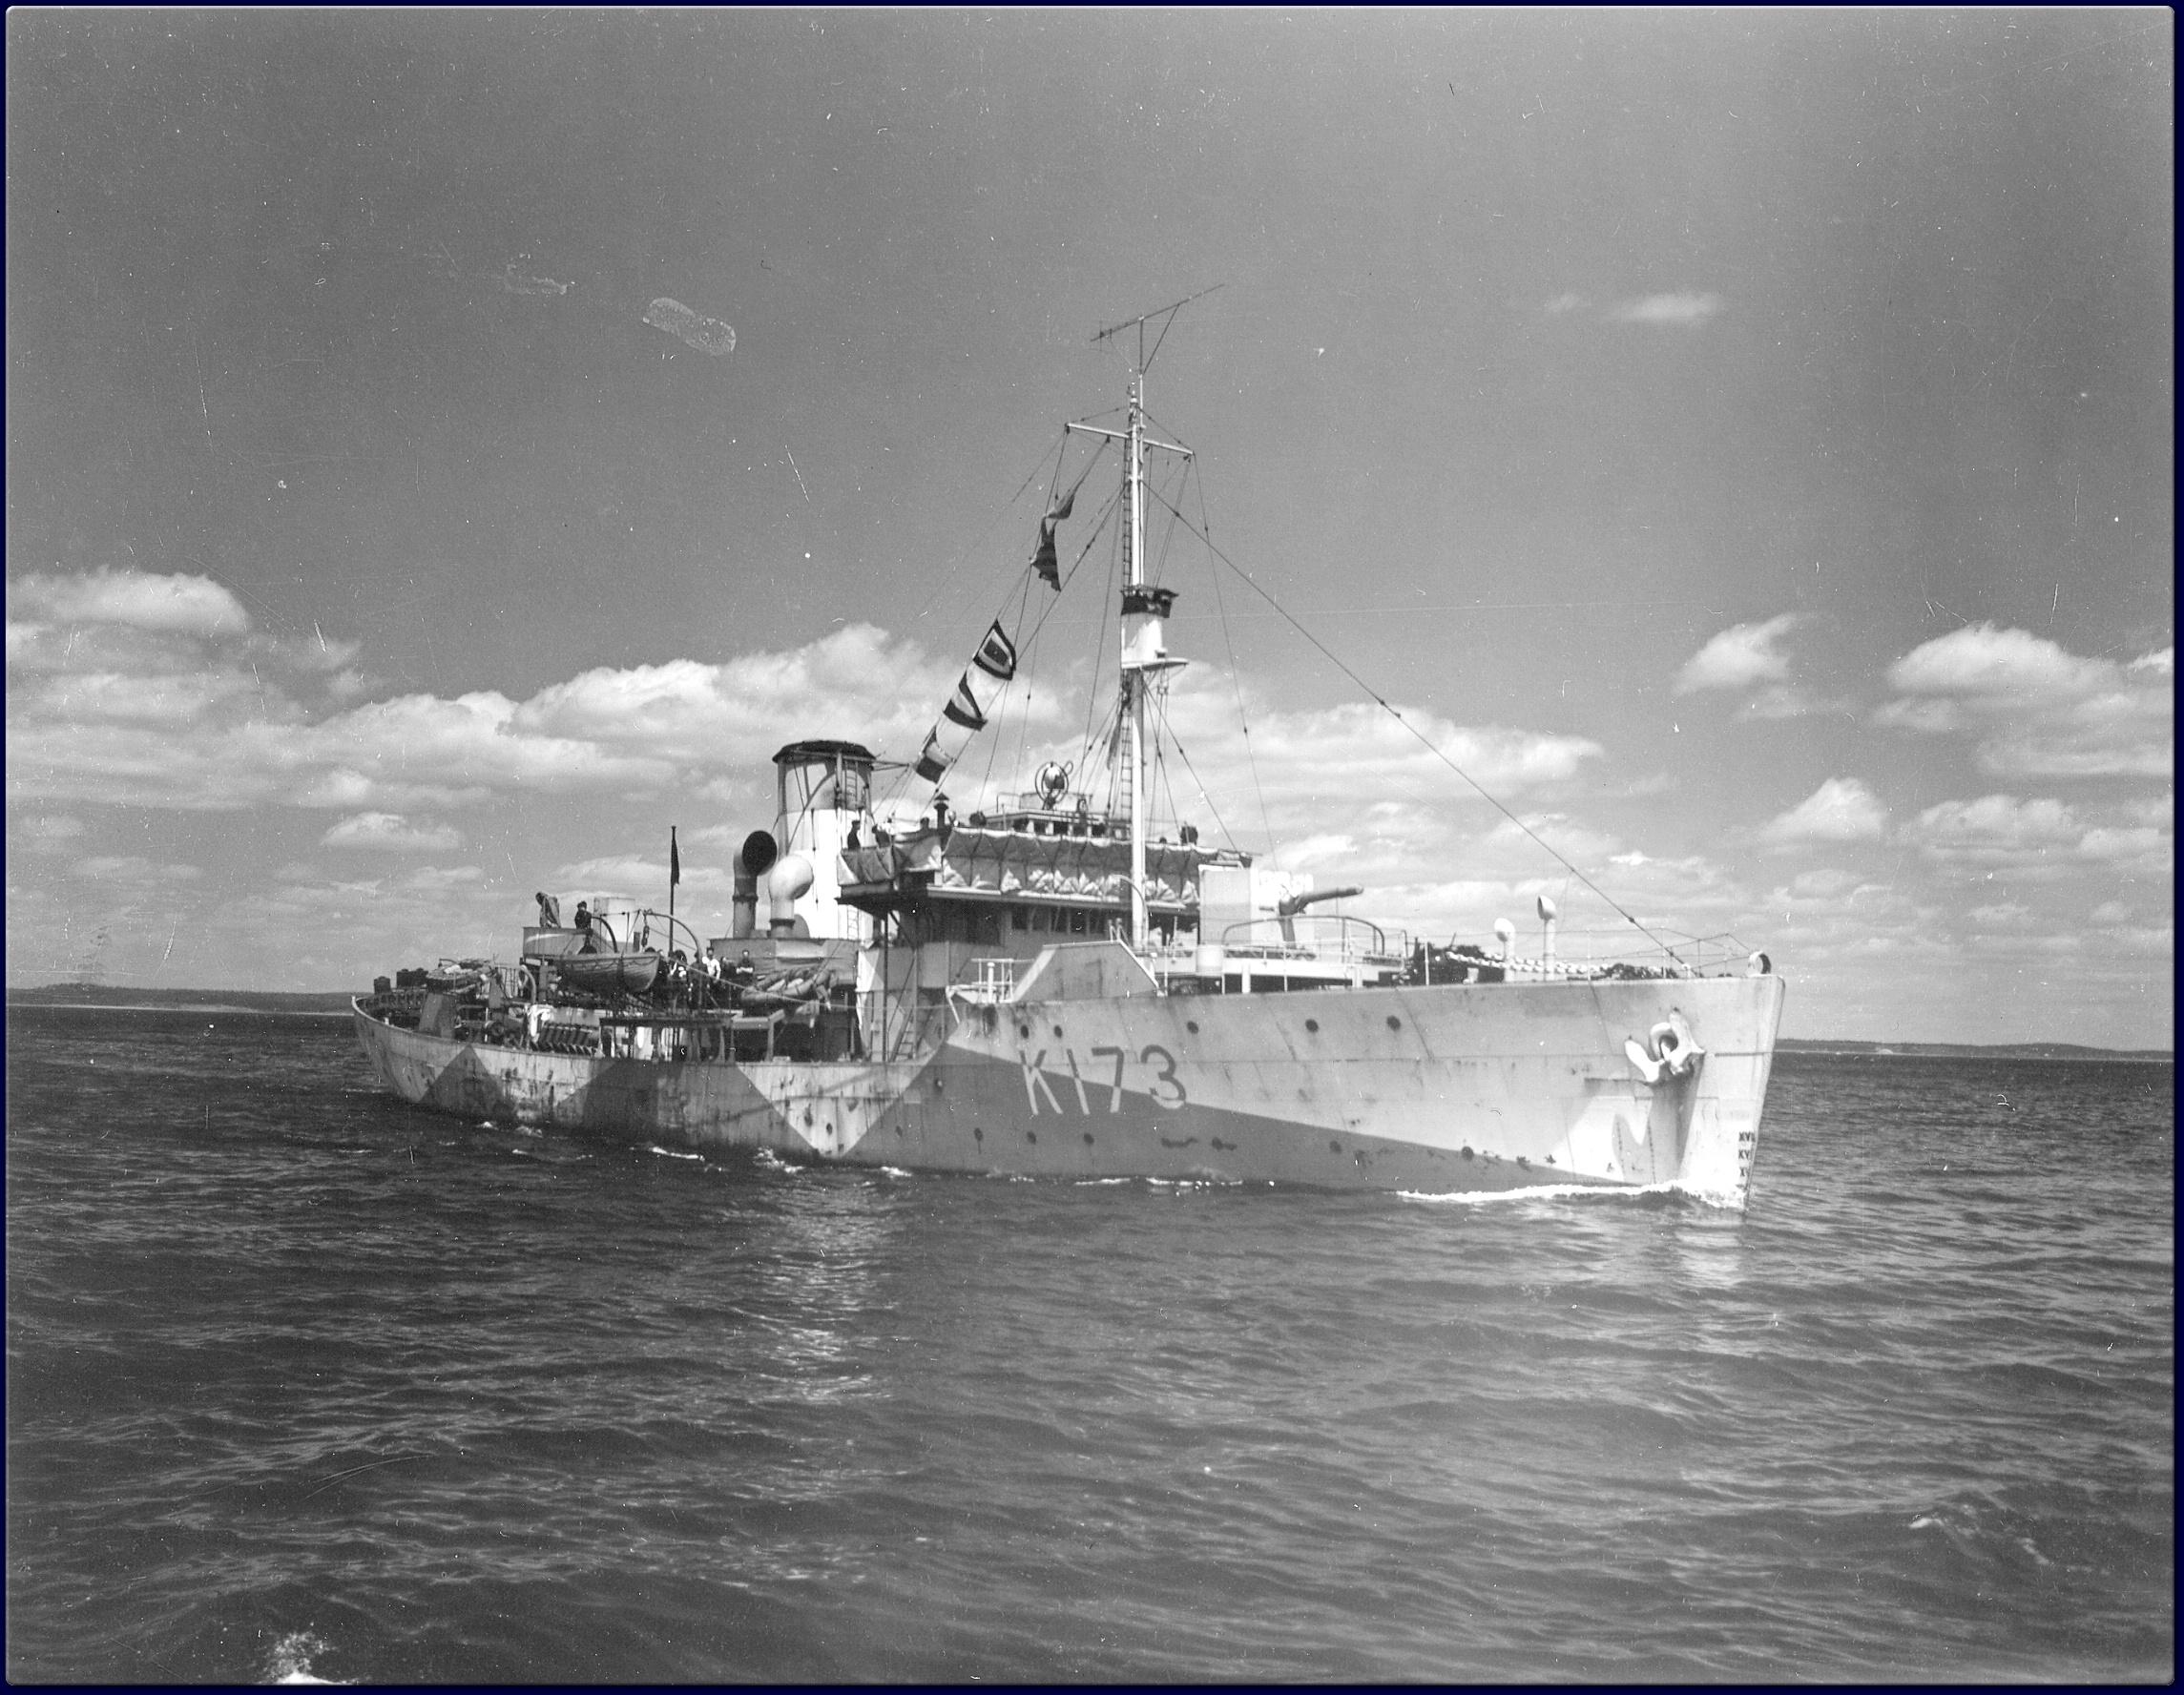 HMCS_Weyburn_1942-1943_NP-1012